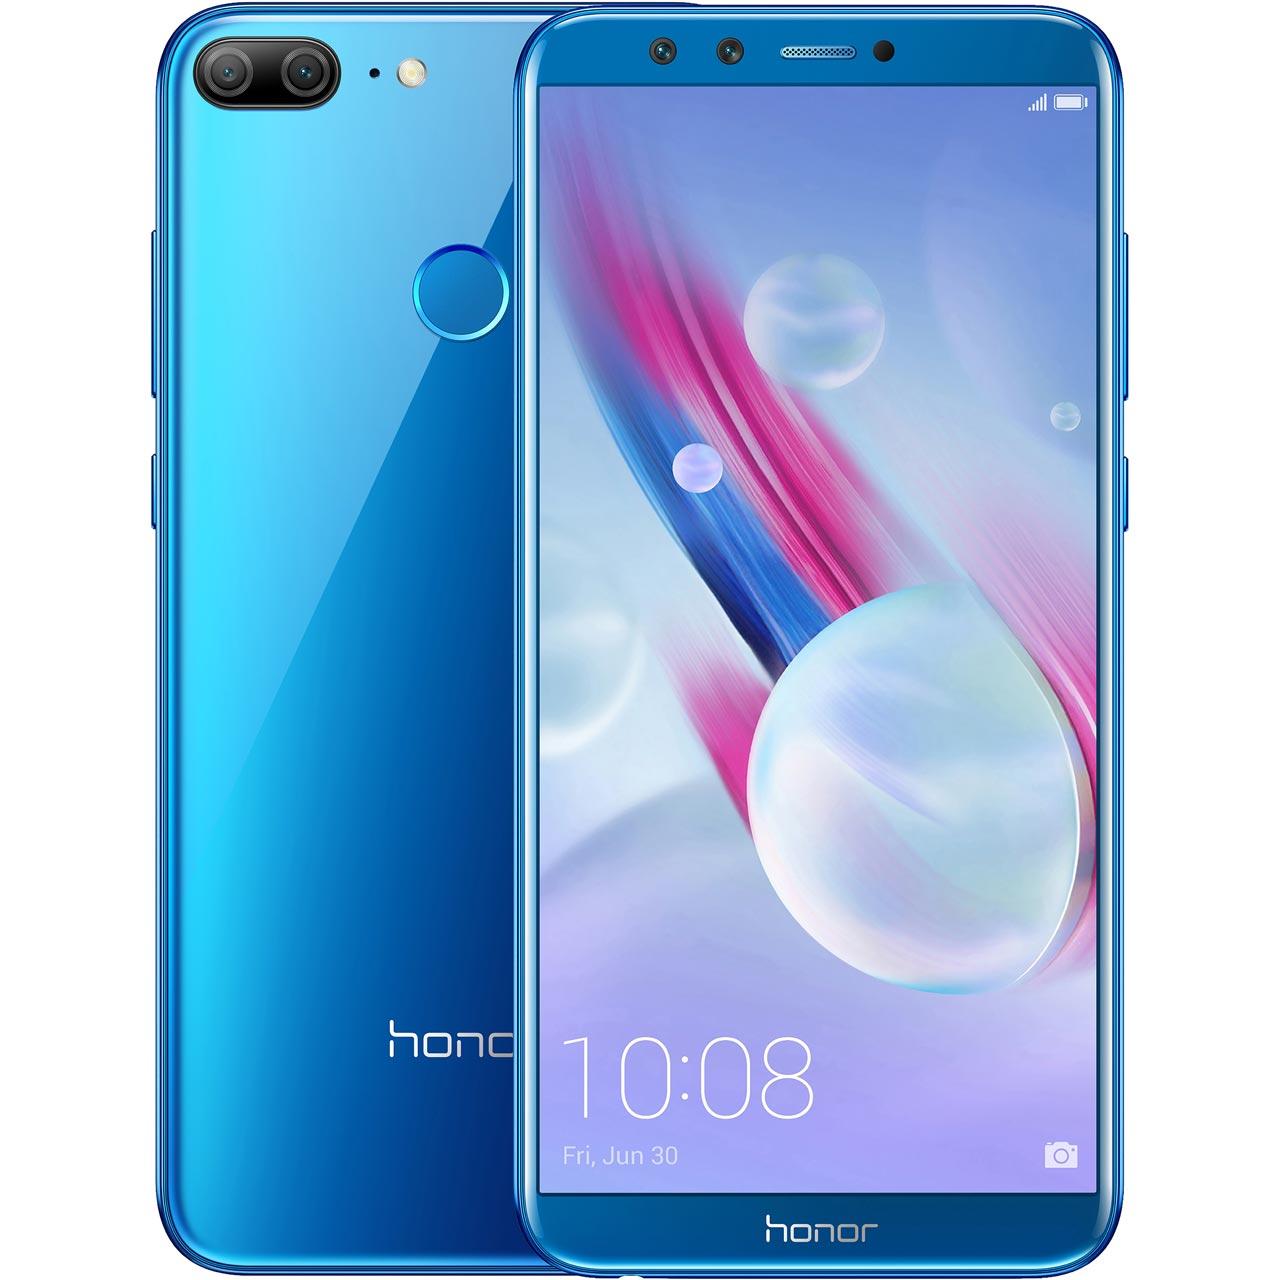 SIM Free Honor 9 Lite 5.65 Inch 32GB 13MP 4G Mobile Phone - Blue - £99.99 delivered @ Argos eBay (Refurb w/ 1 Year Guarantee)